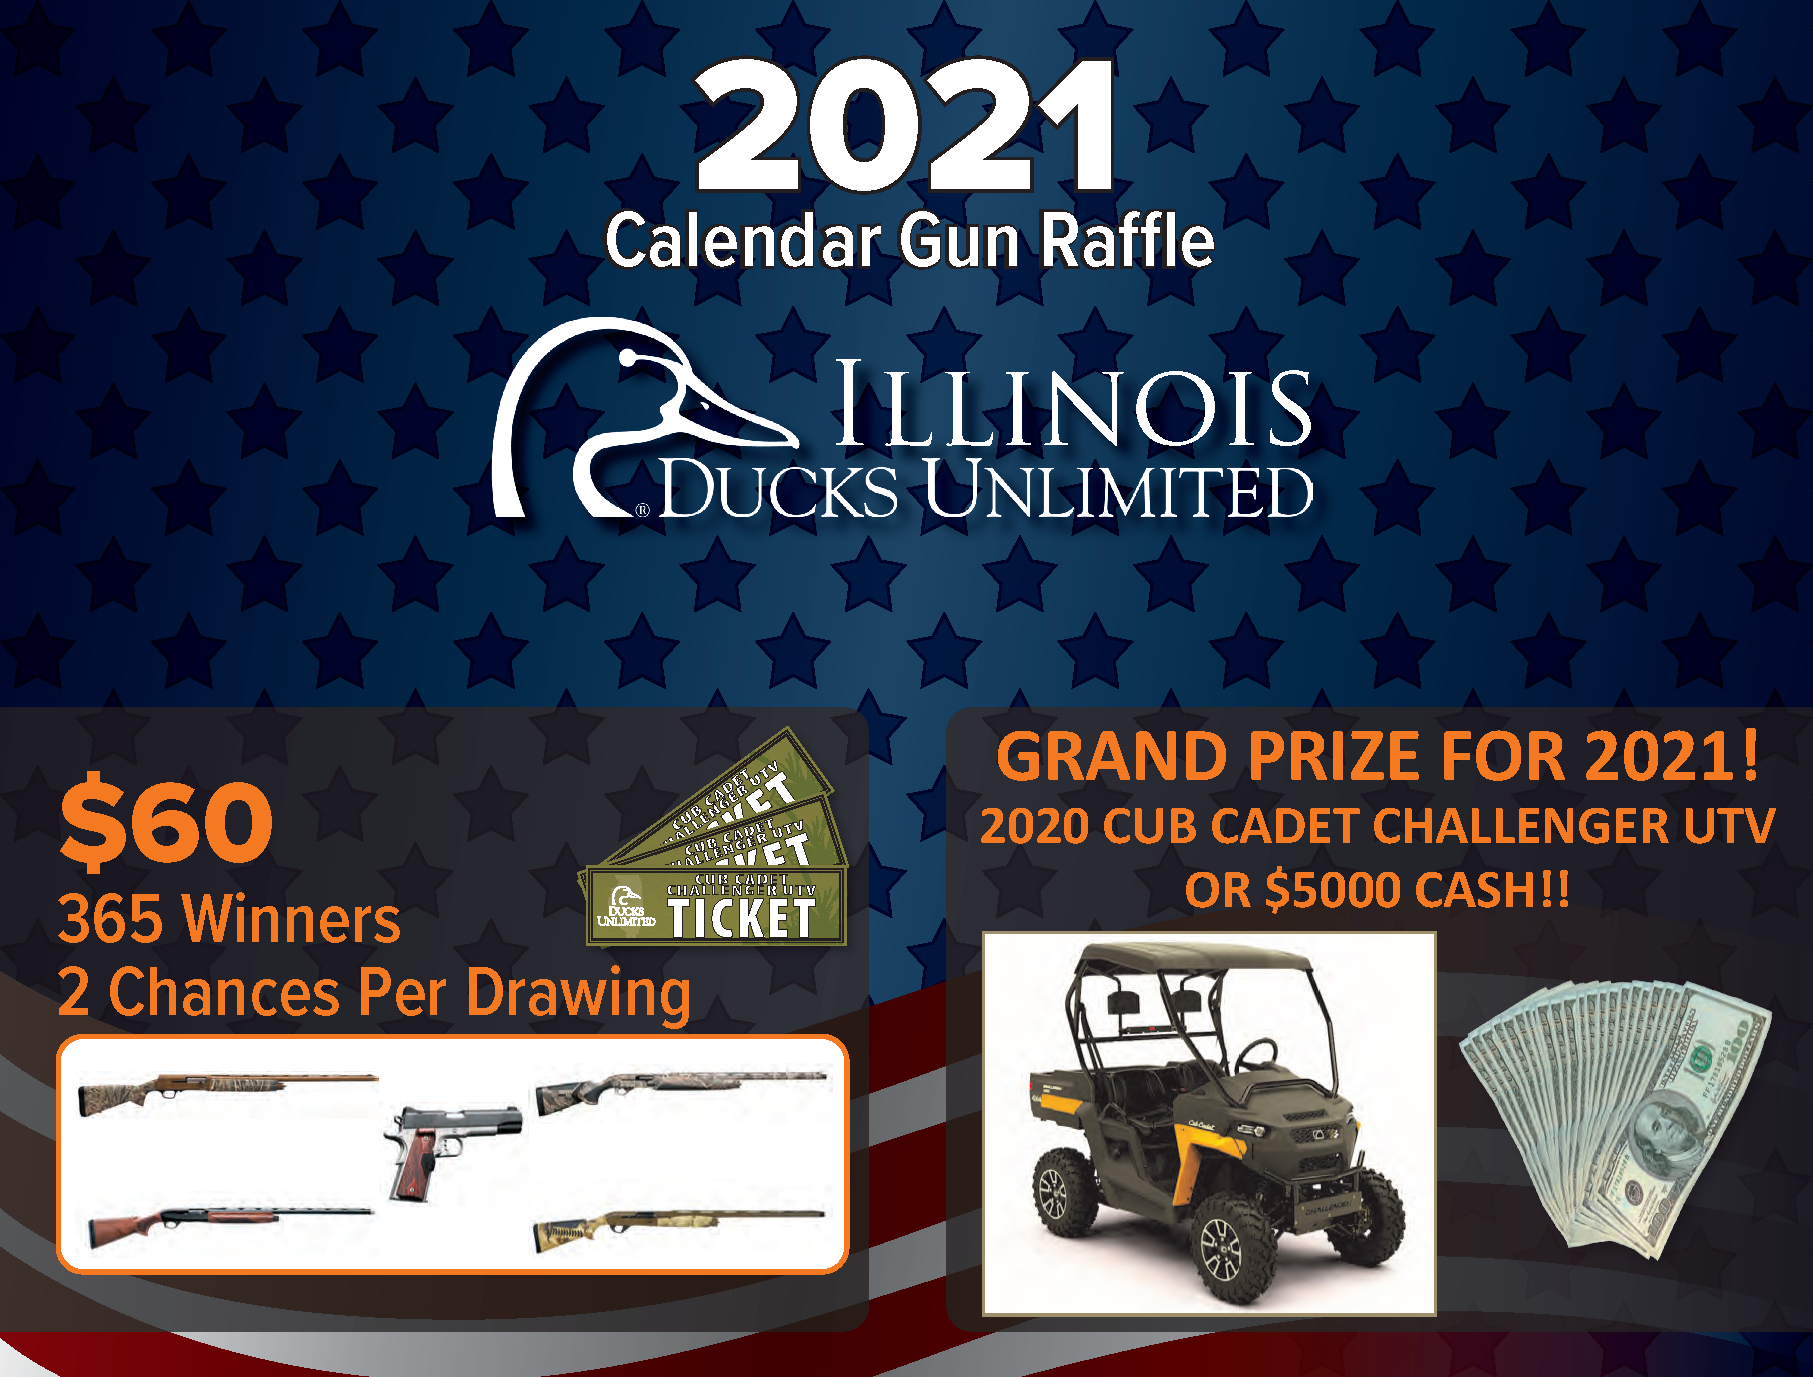 2021 Illinois Calendar Gun Raffle